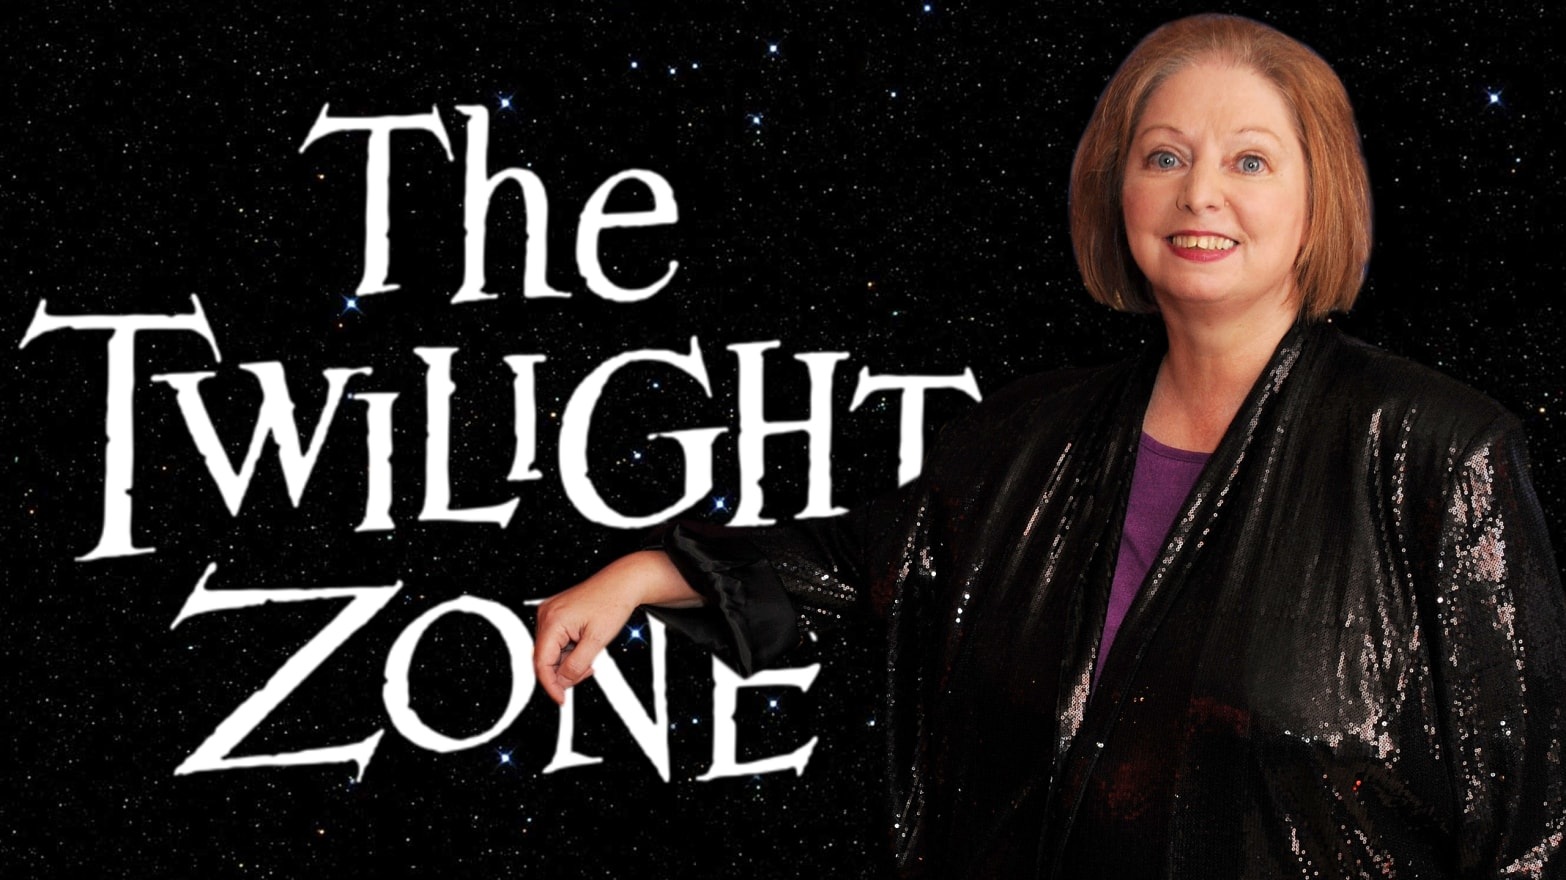 Mantel Visits Hilary Zone The Twilight tQCxshrd